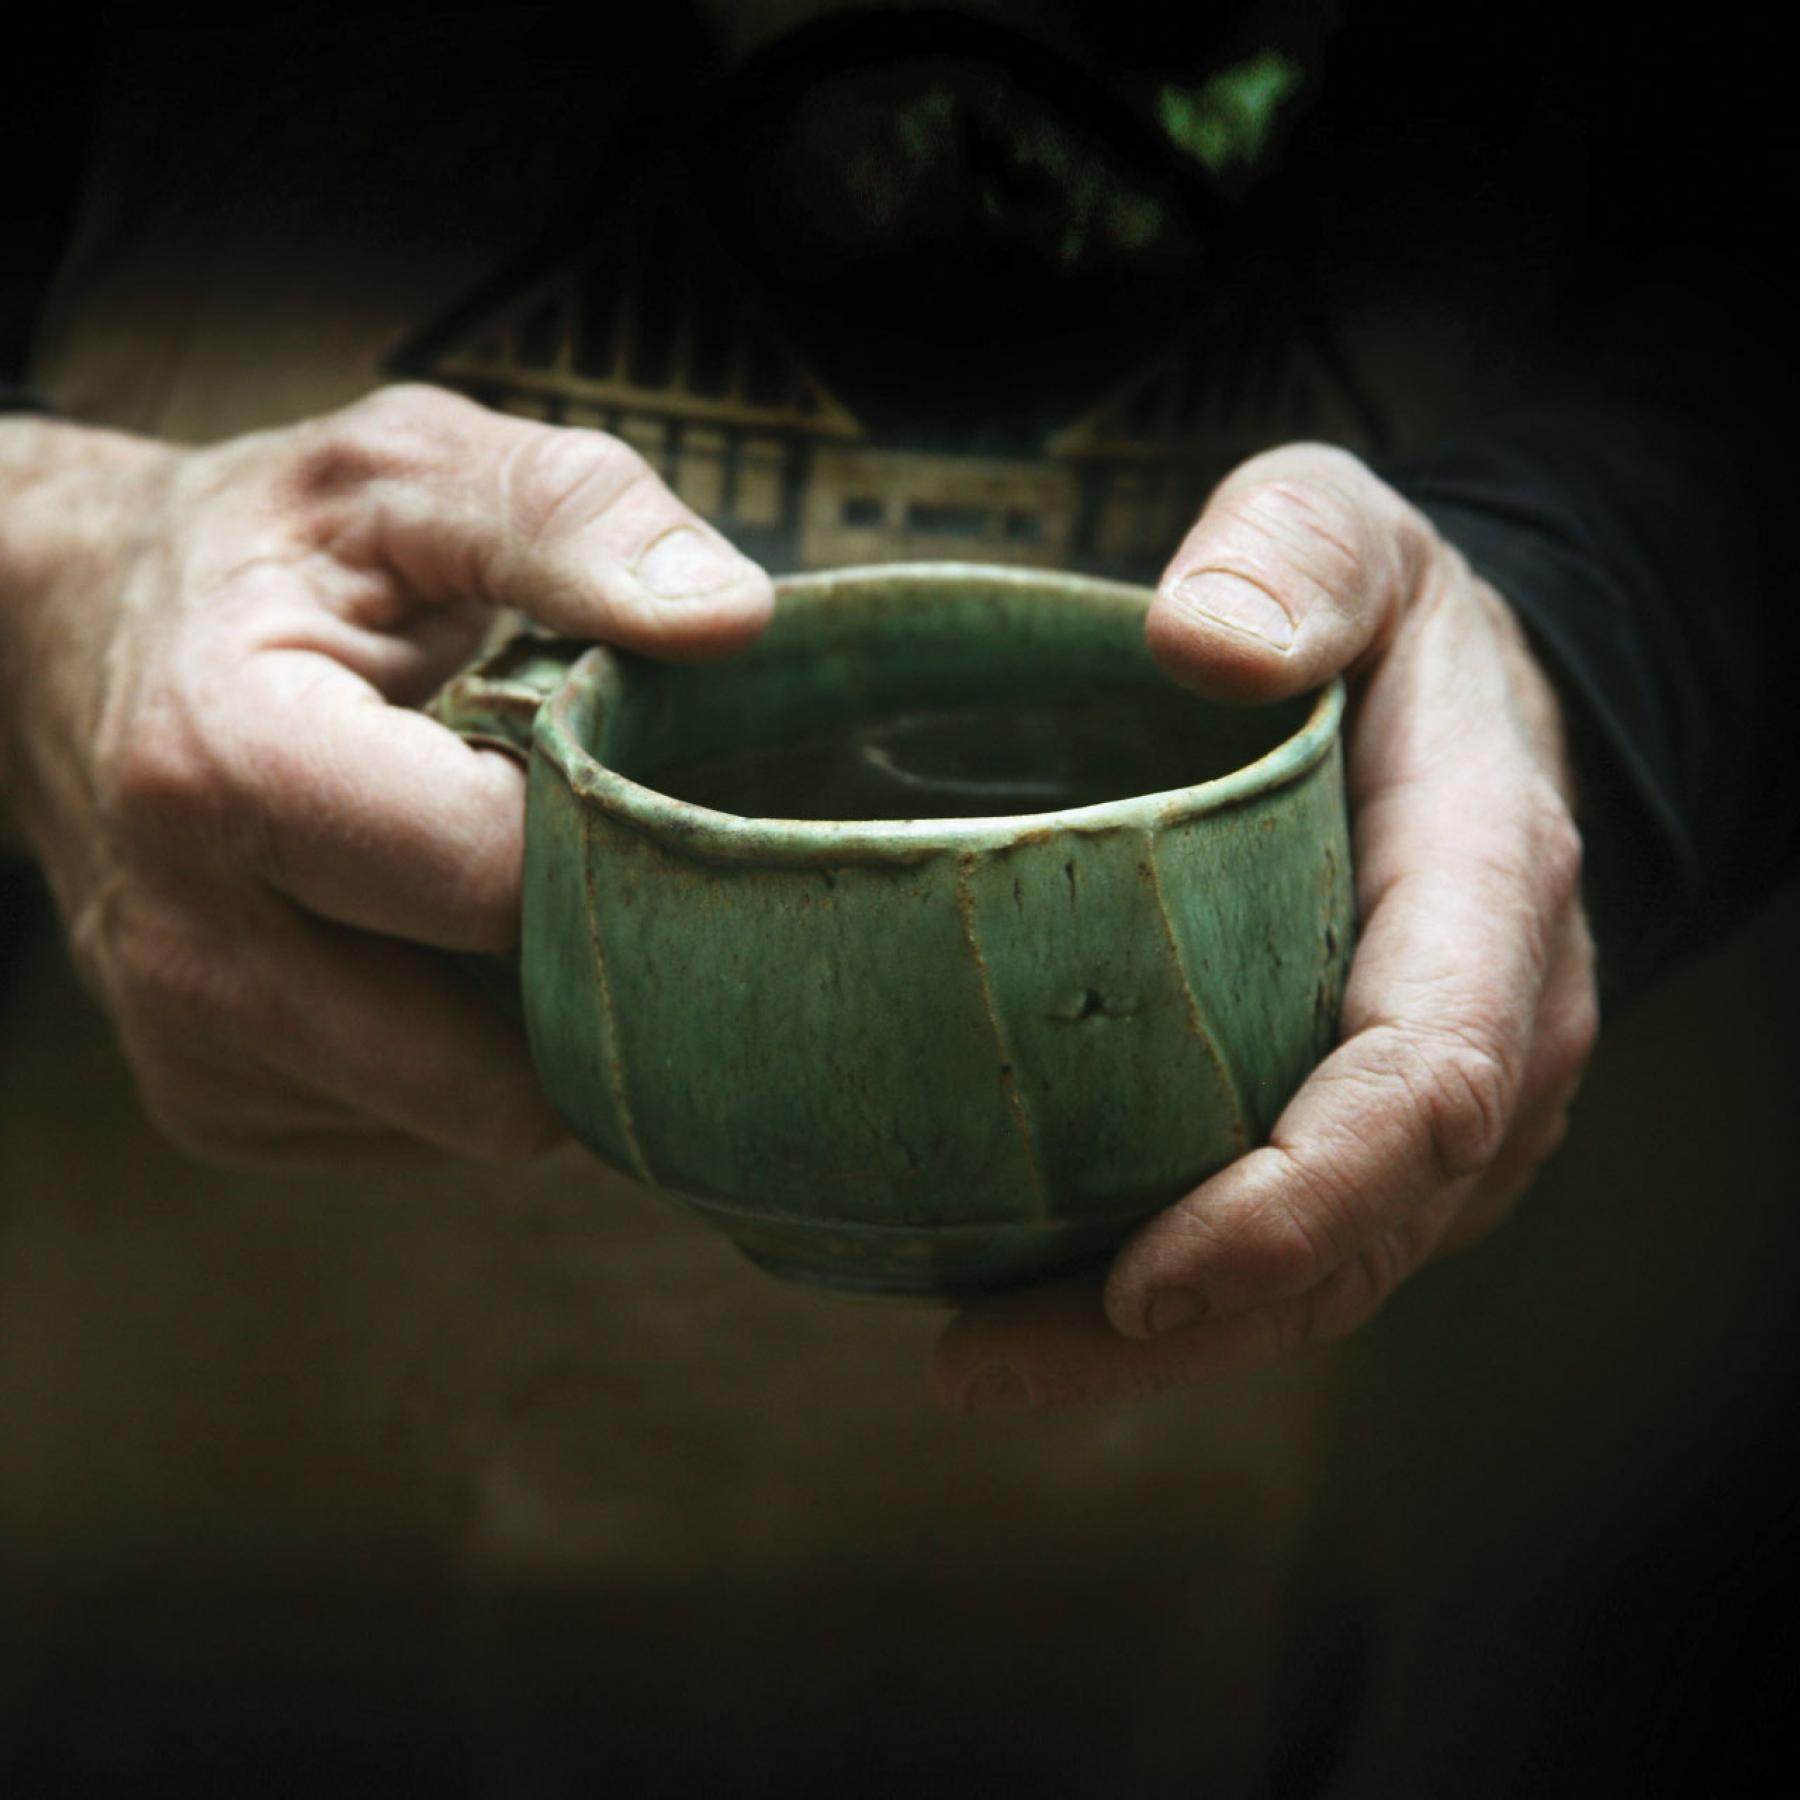 CandiaStrom - Φιλοσοφία Με το χέρι 1